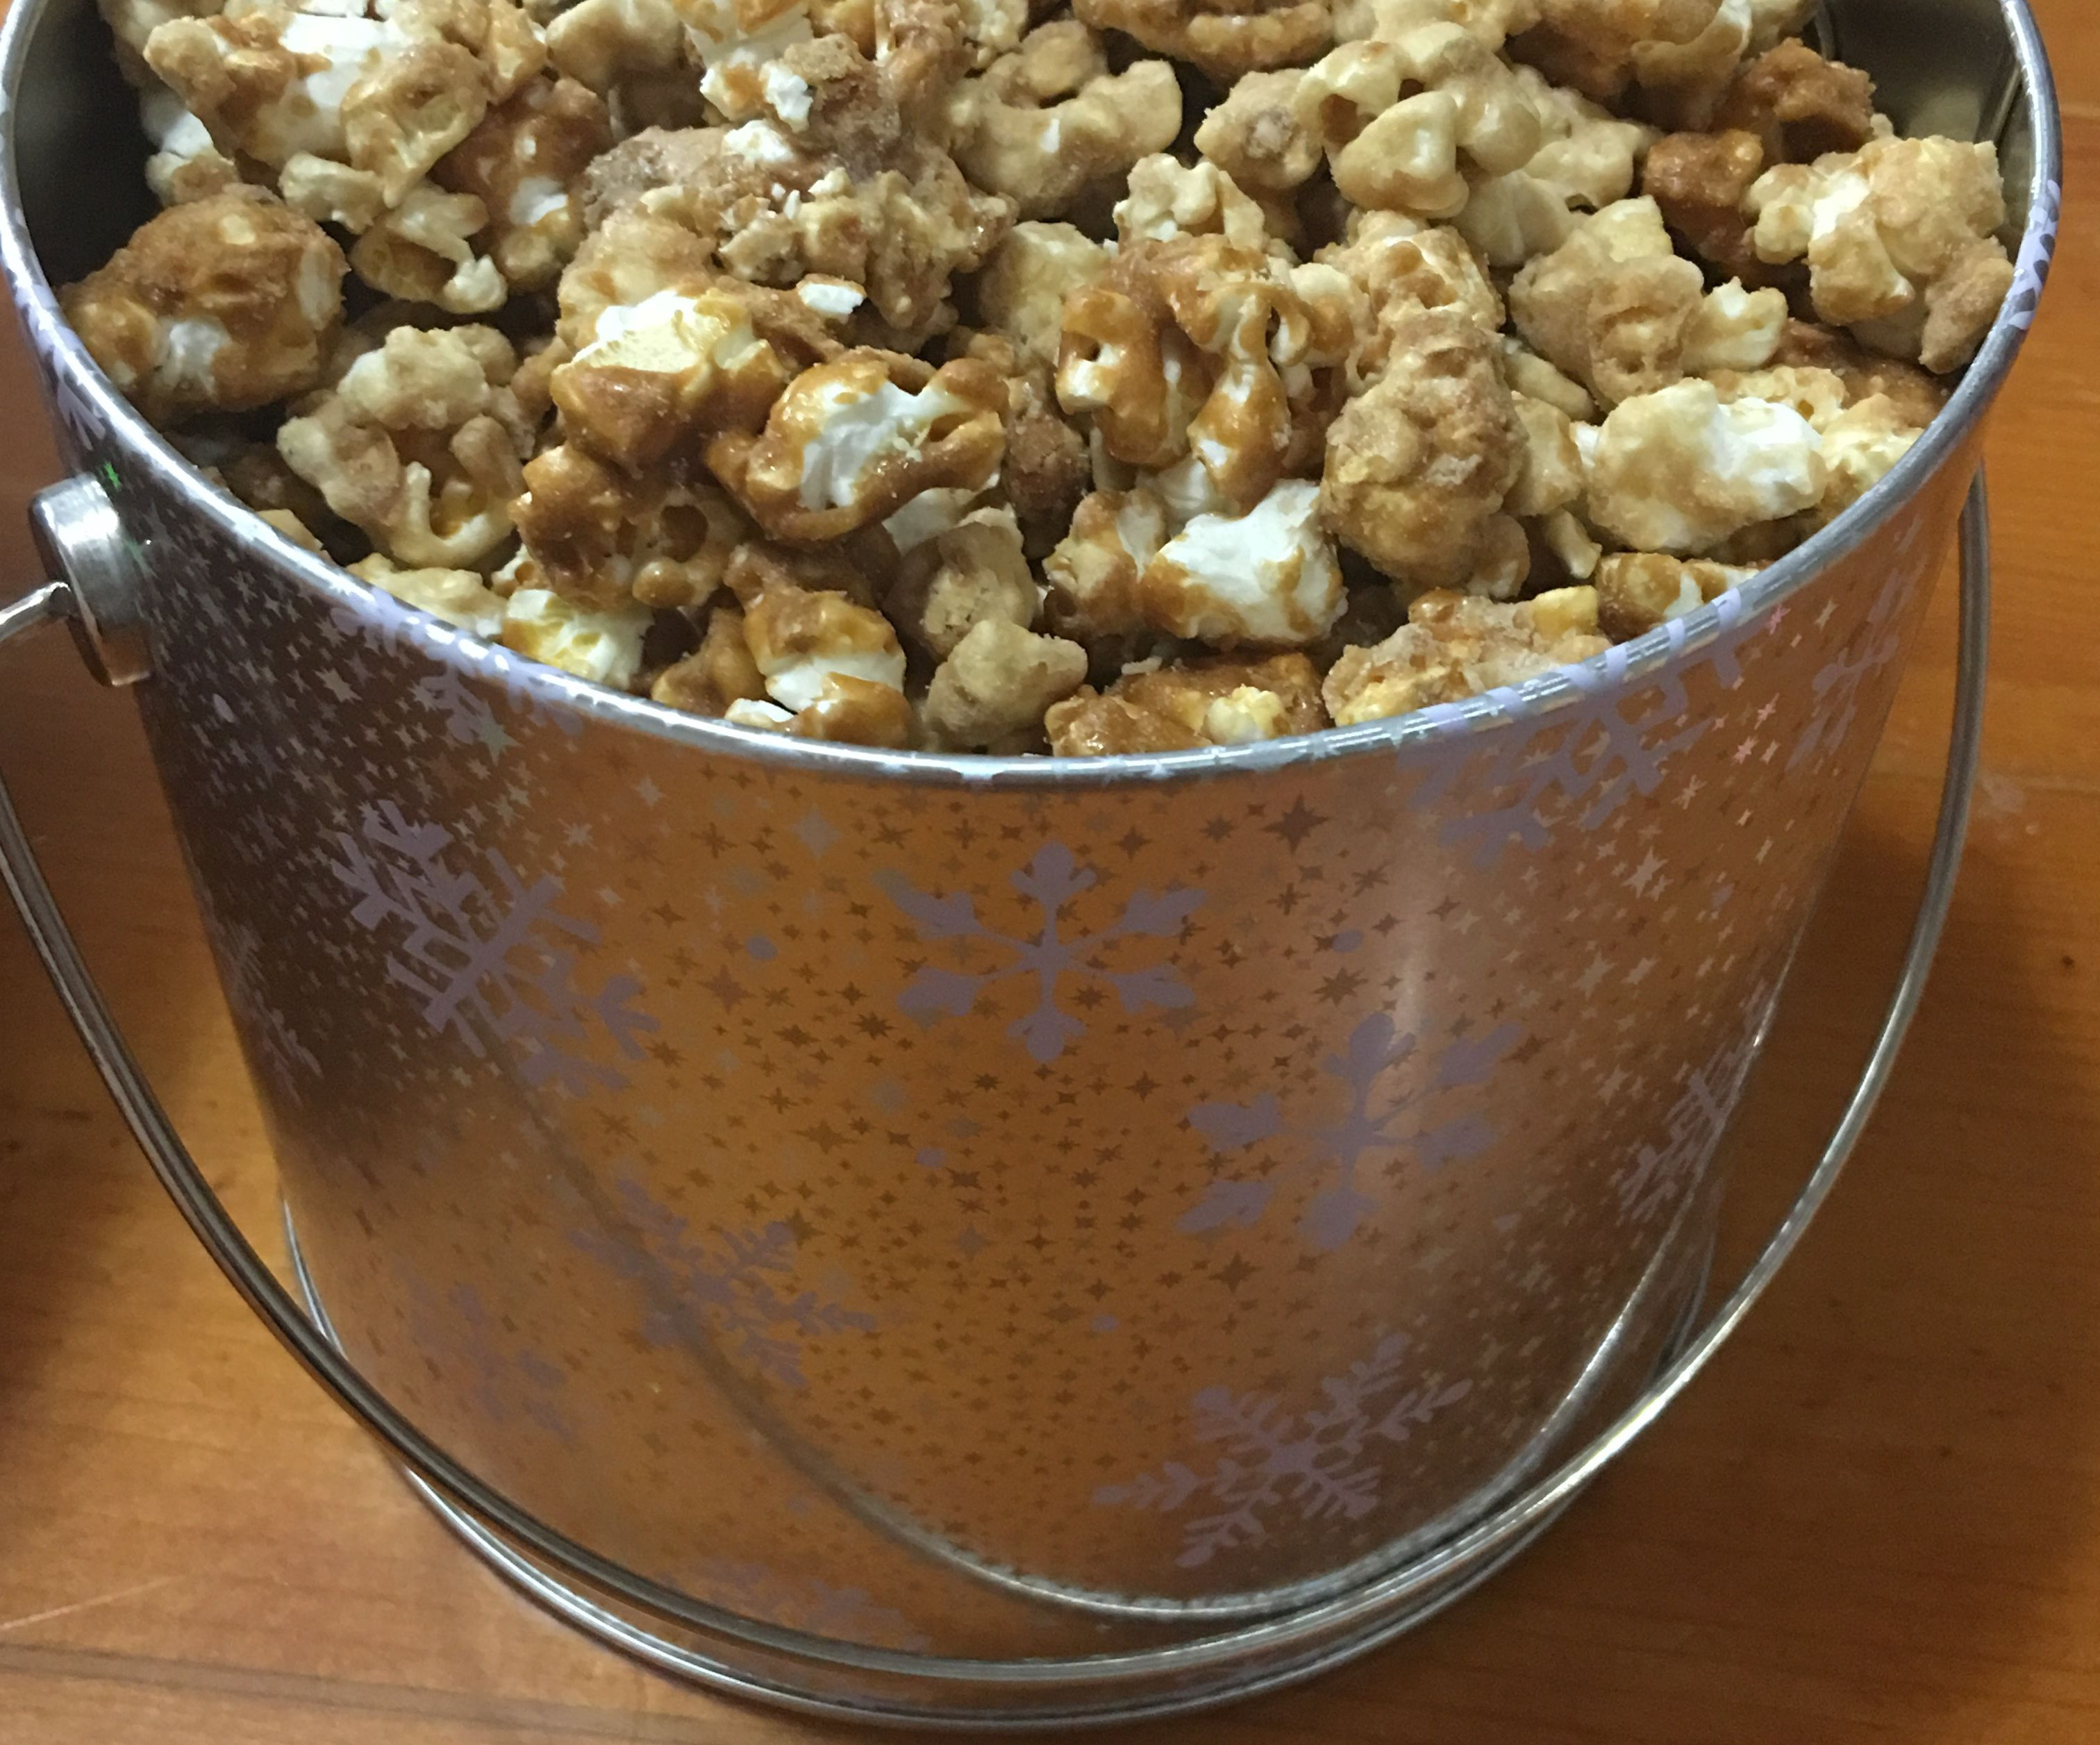 Baked Carmel Popcorn (Without Corn Syrup)